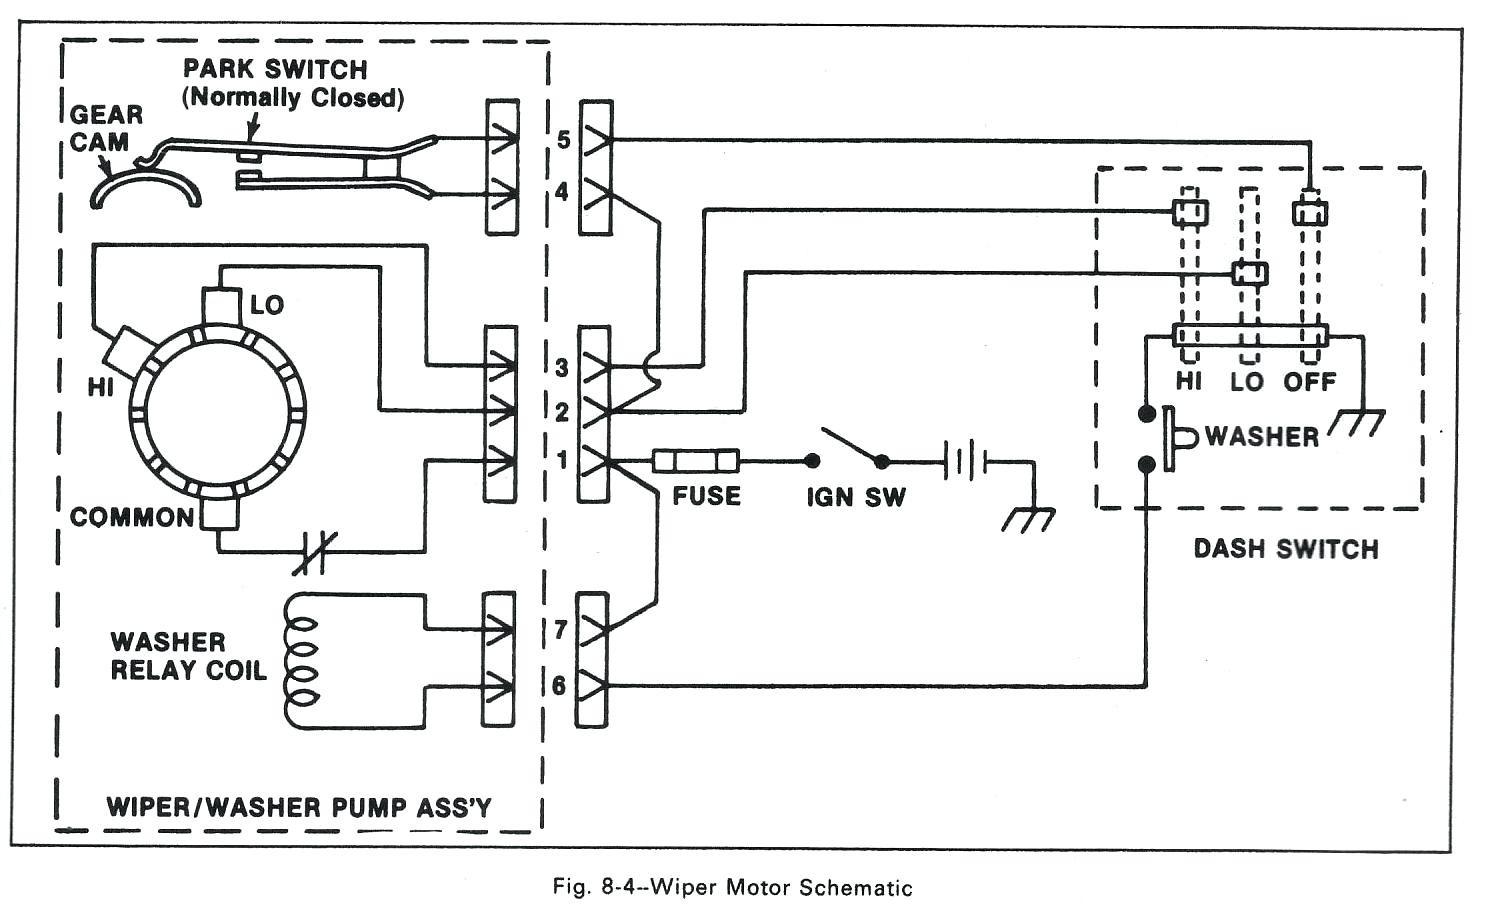 buick wiper motor wiring diagram schematic wiring diagrams u2022 rh detox design co GM Wiper Motor Wiring GM Wiper Switch Wiring Diagram